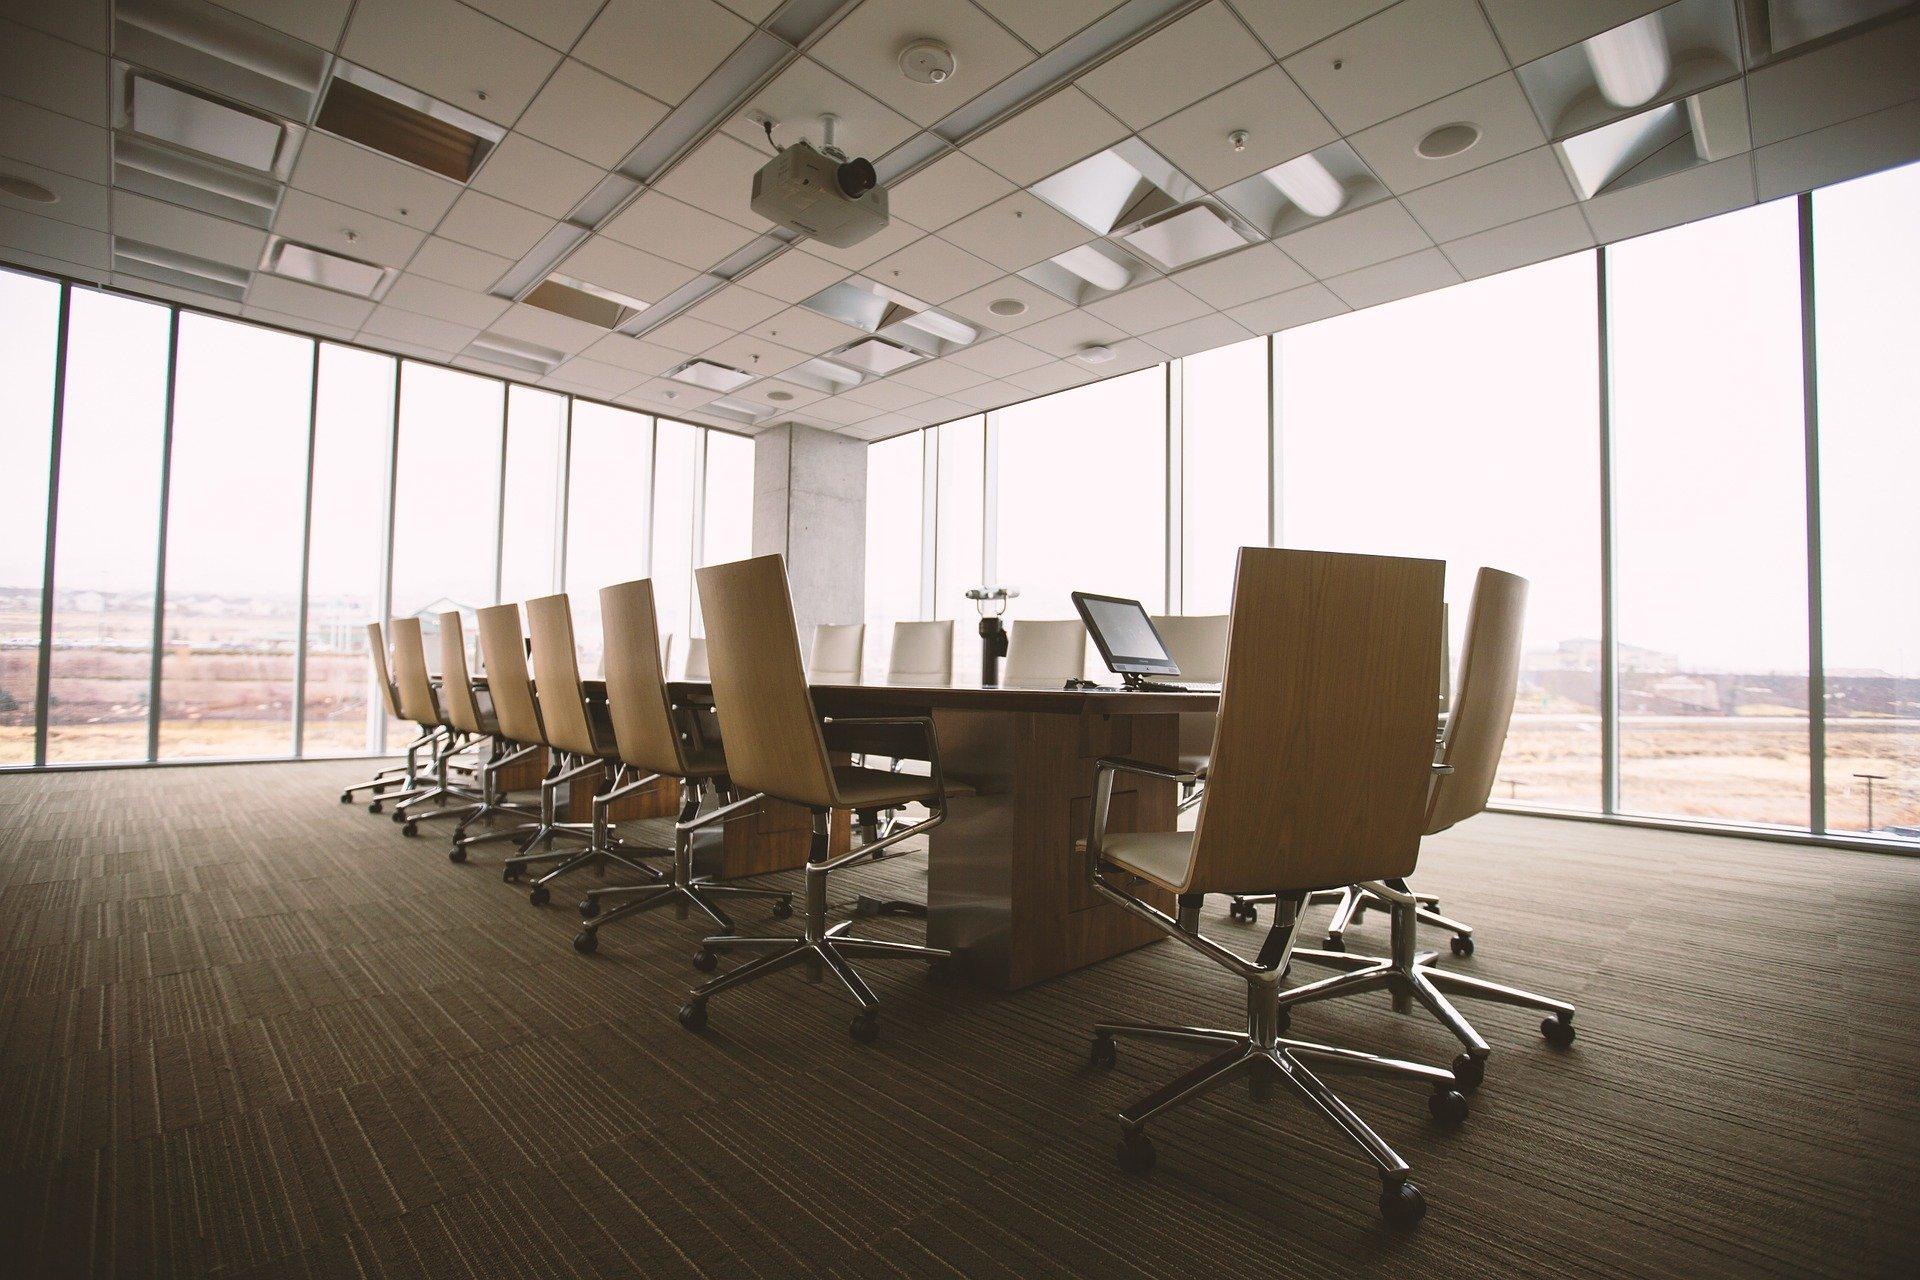 conference room 768441 1920 15. Juni 2021